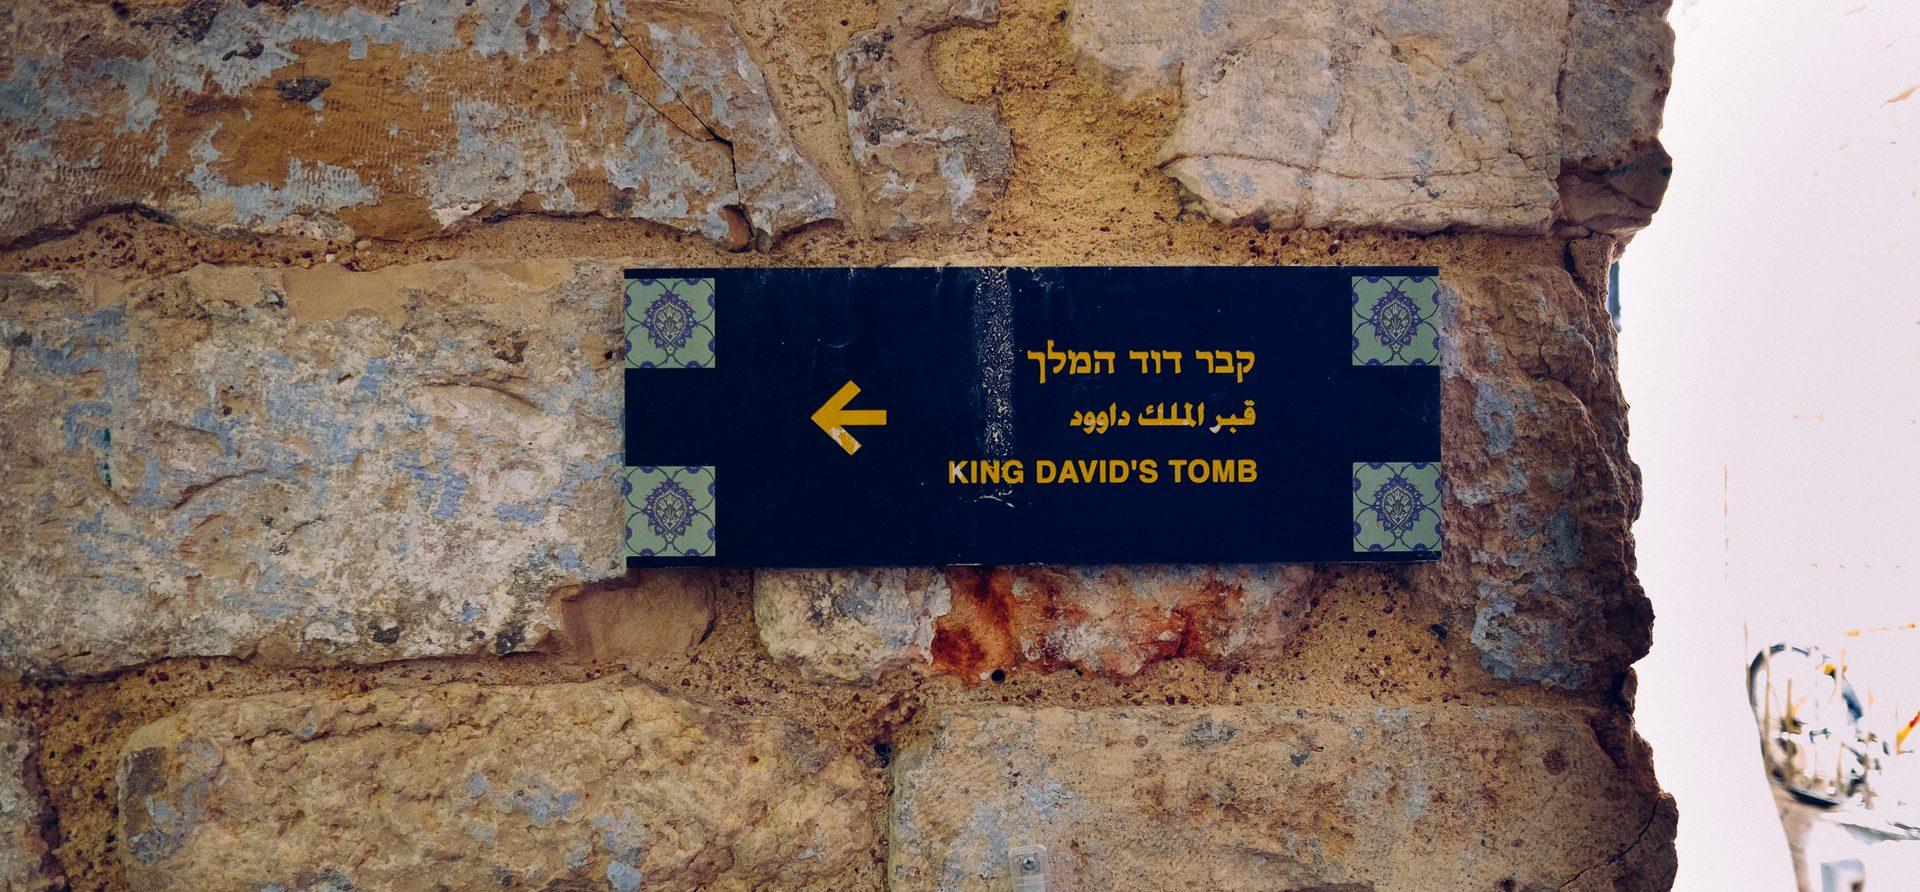 Israel Egypt travel Ivan Vukovic guide Dubrovnik GoDubrovnik